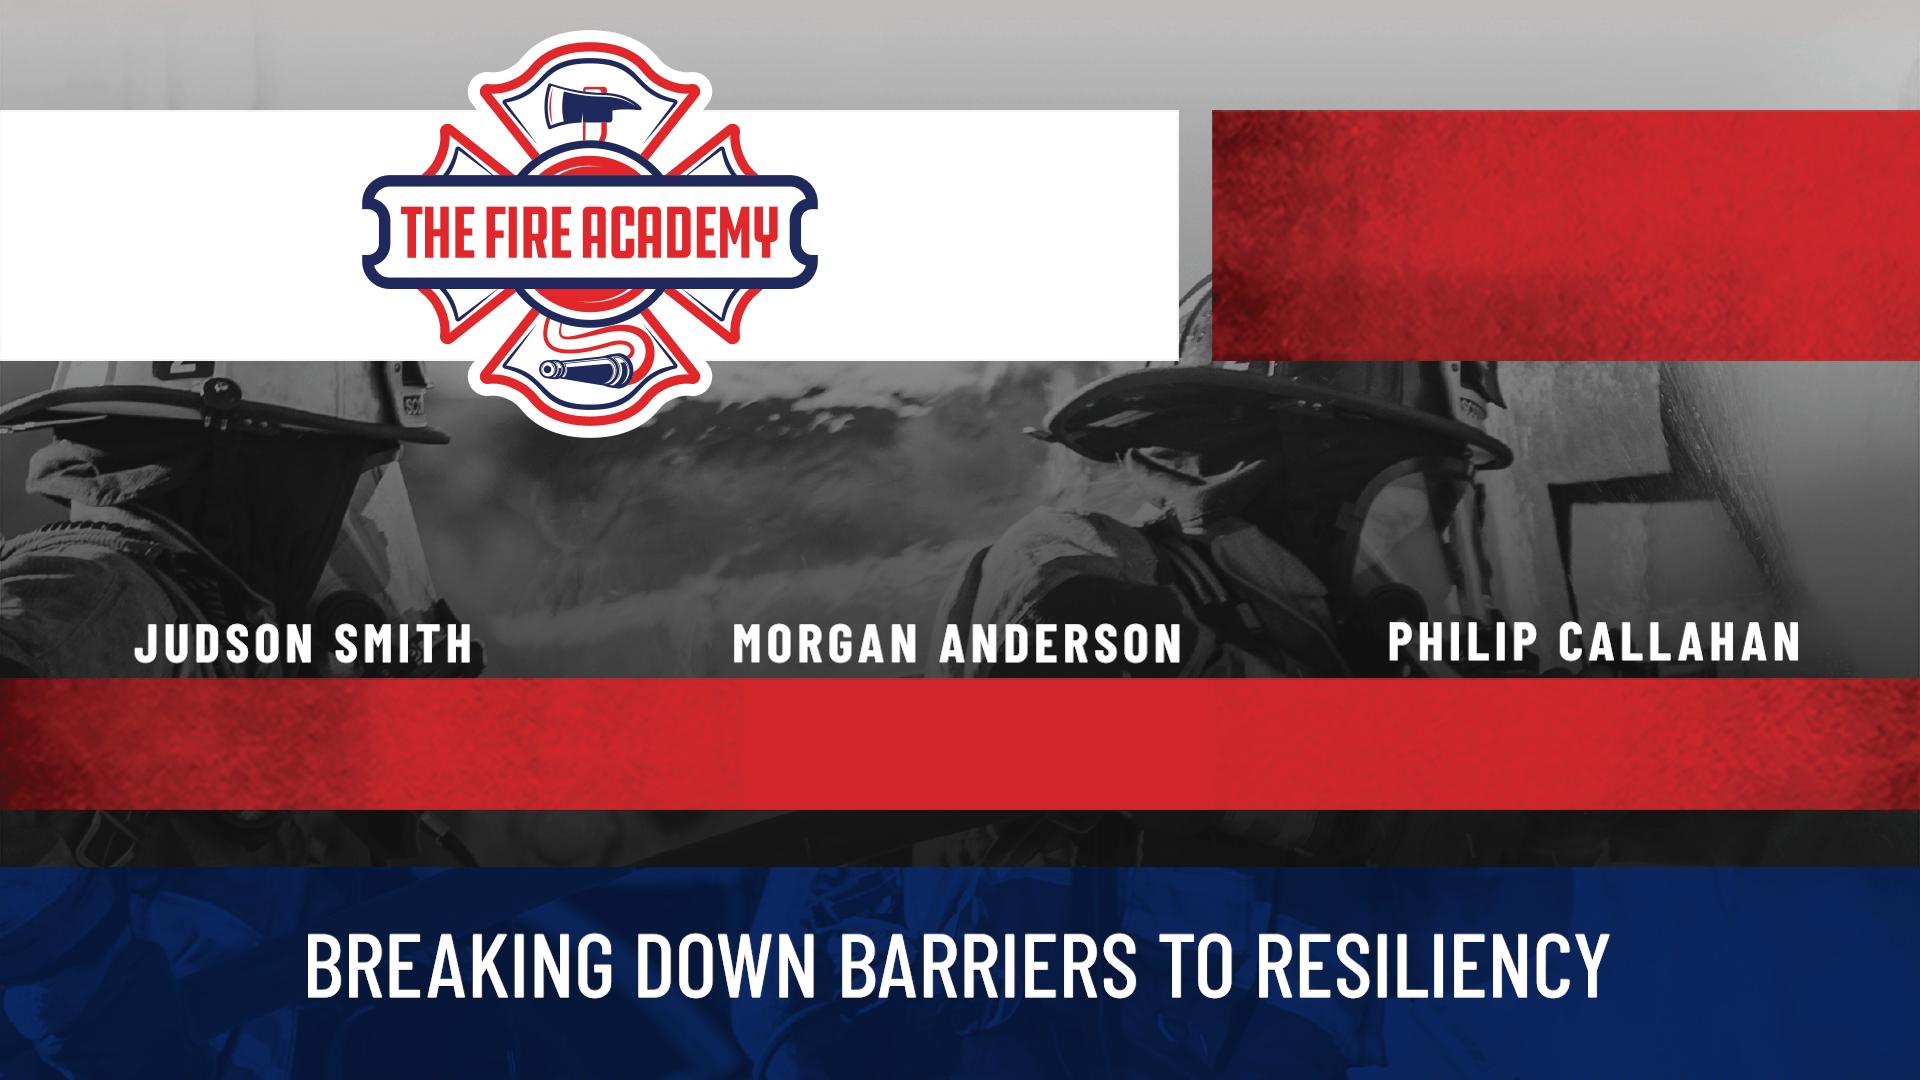 Breaking Down Barriers to Resiliency